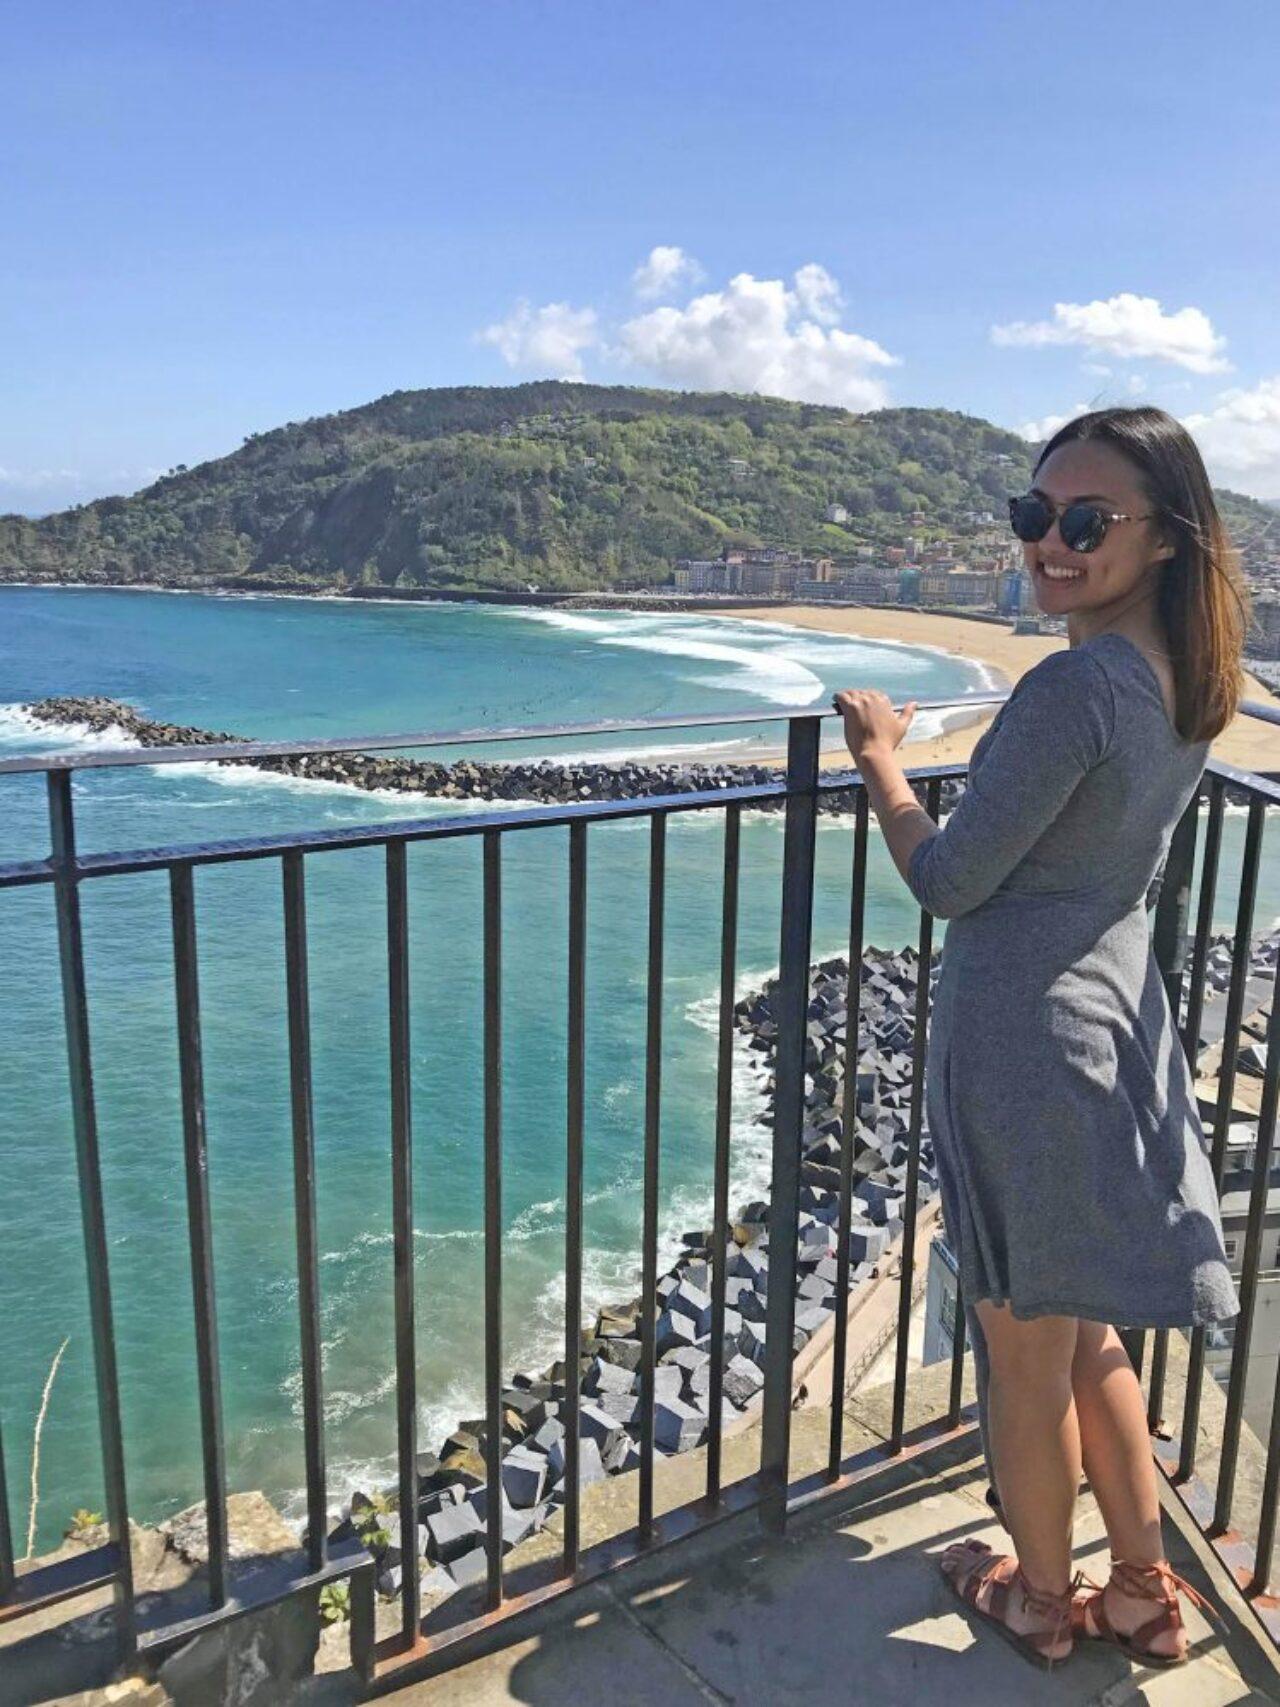 Ediza Koch on balcony looking over ocean